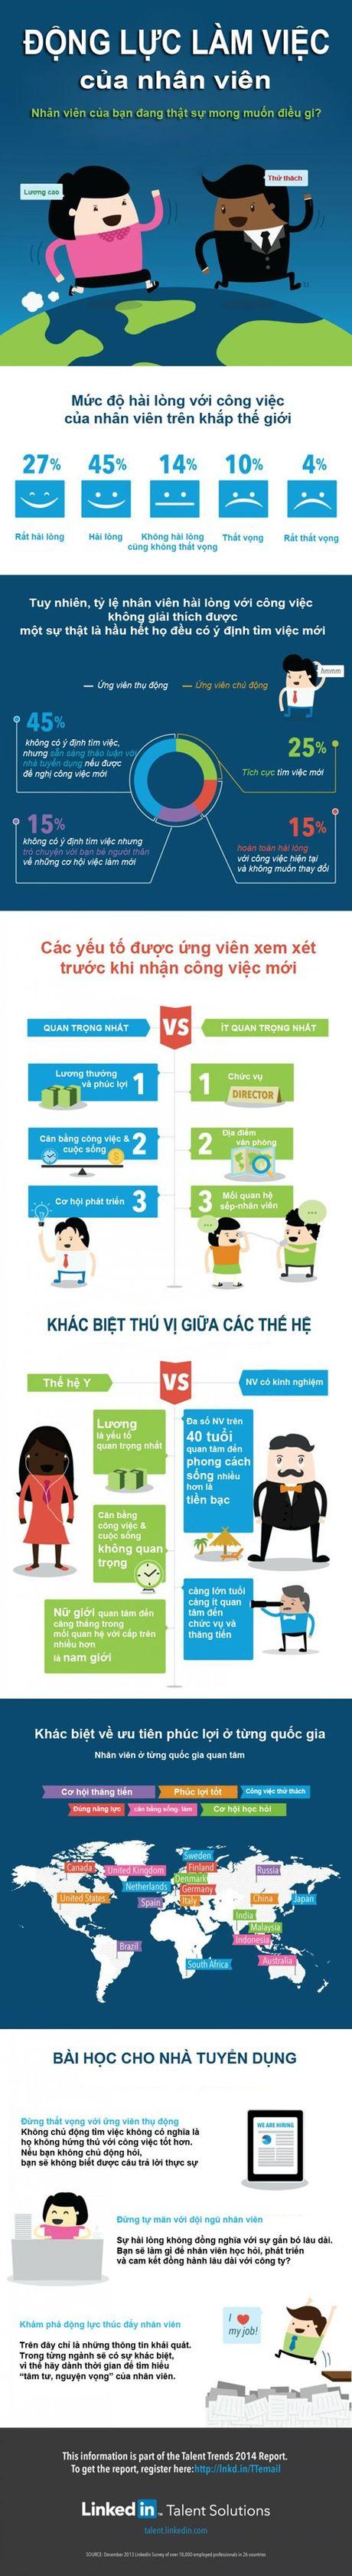 Infographic: Hieu ve dong luc lam viec cua nhan vien - Anh 2